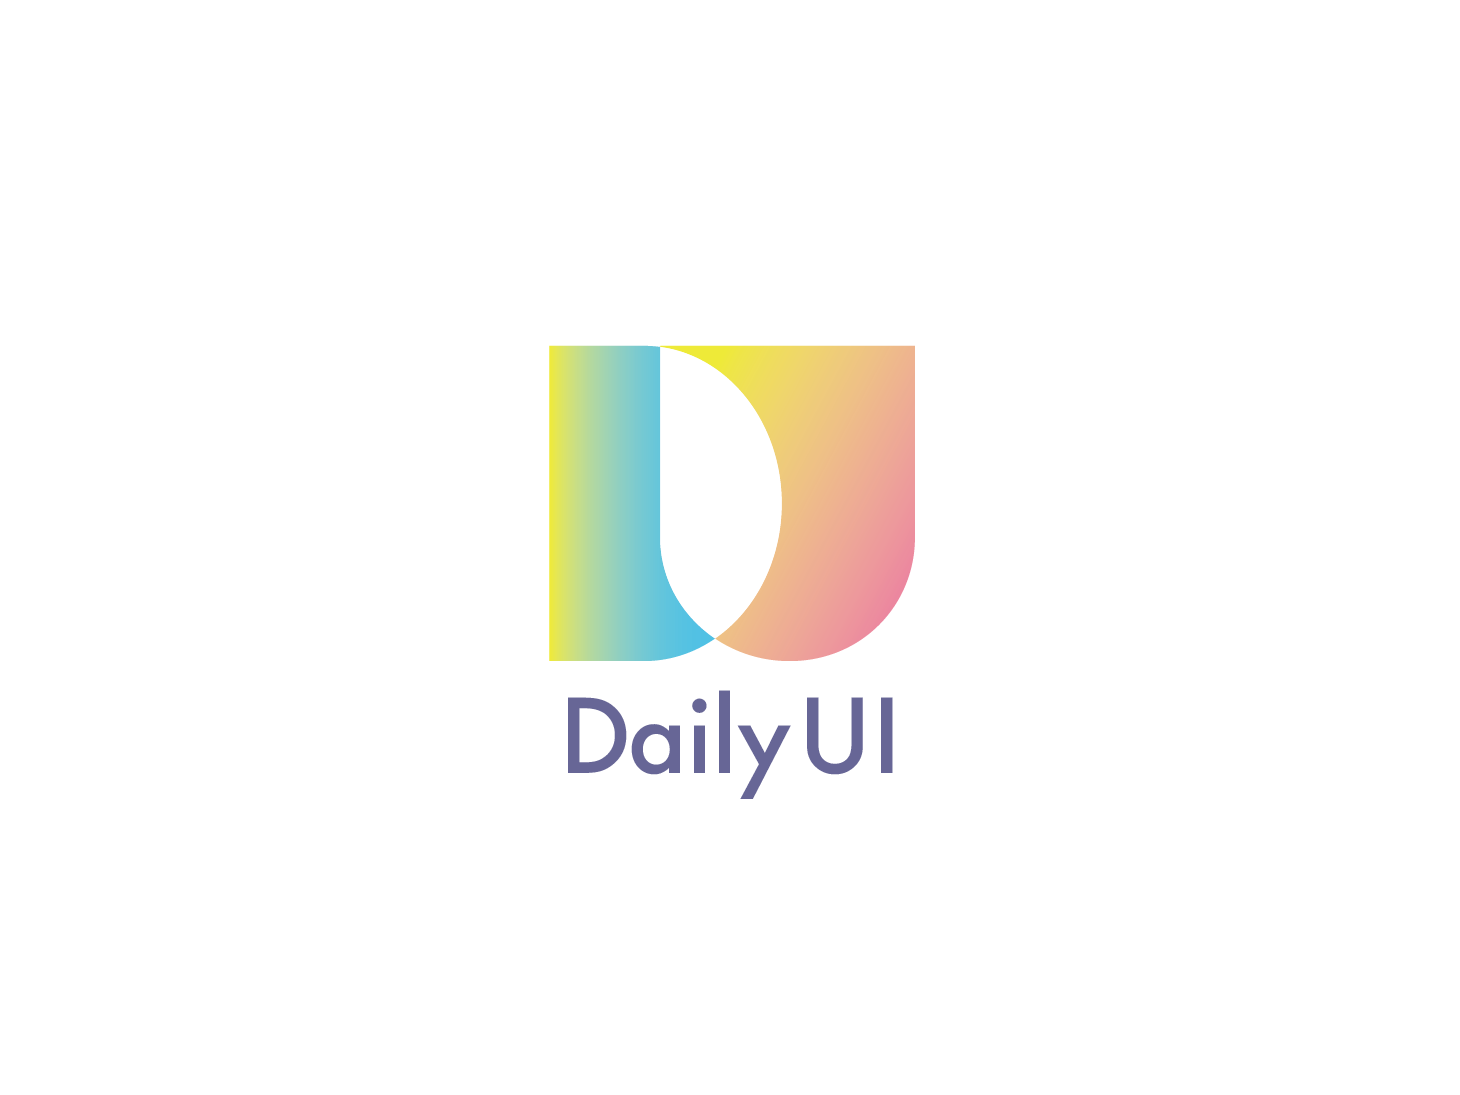 052 dailyui052 daily ui 052 052 daily ui challange dailyui